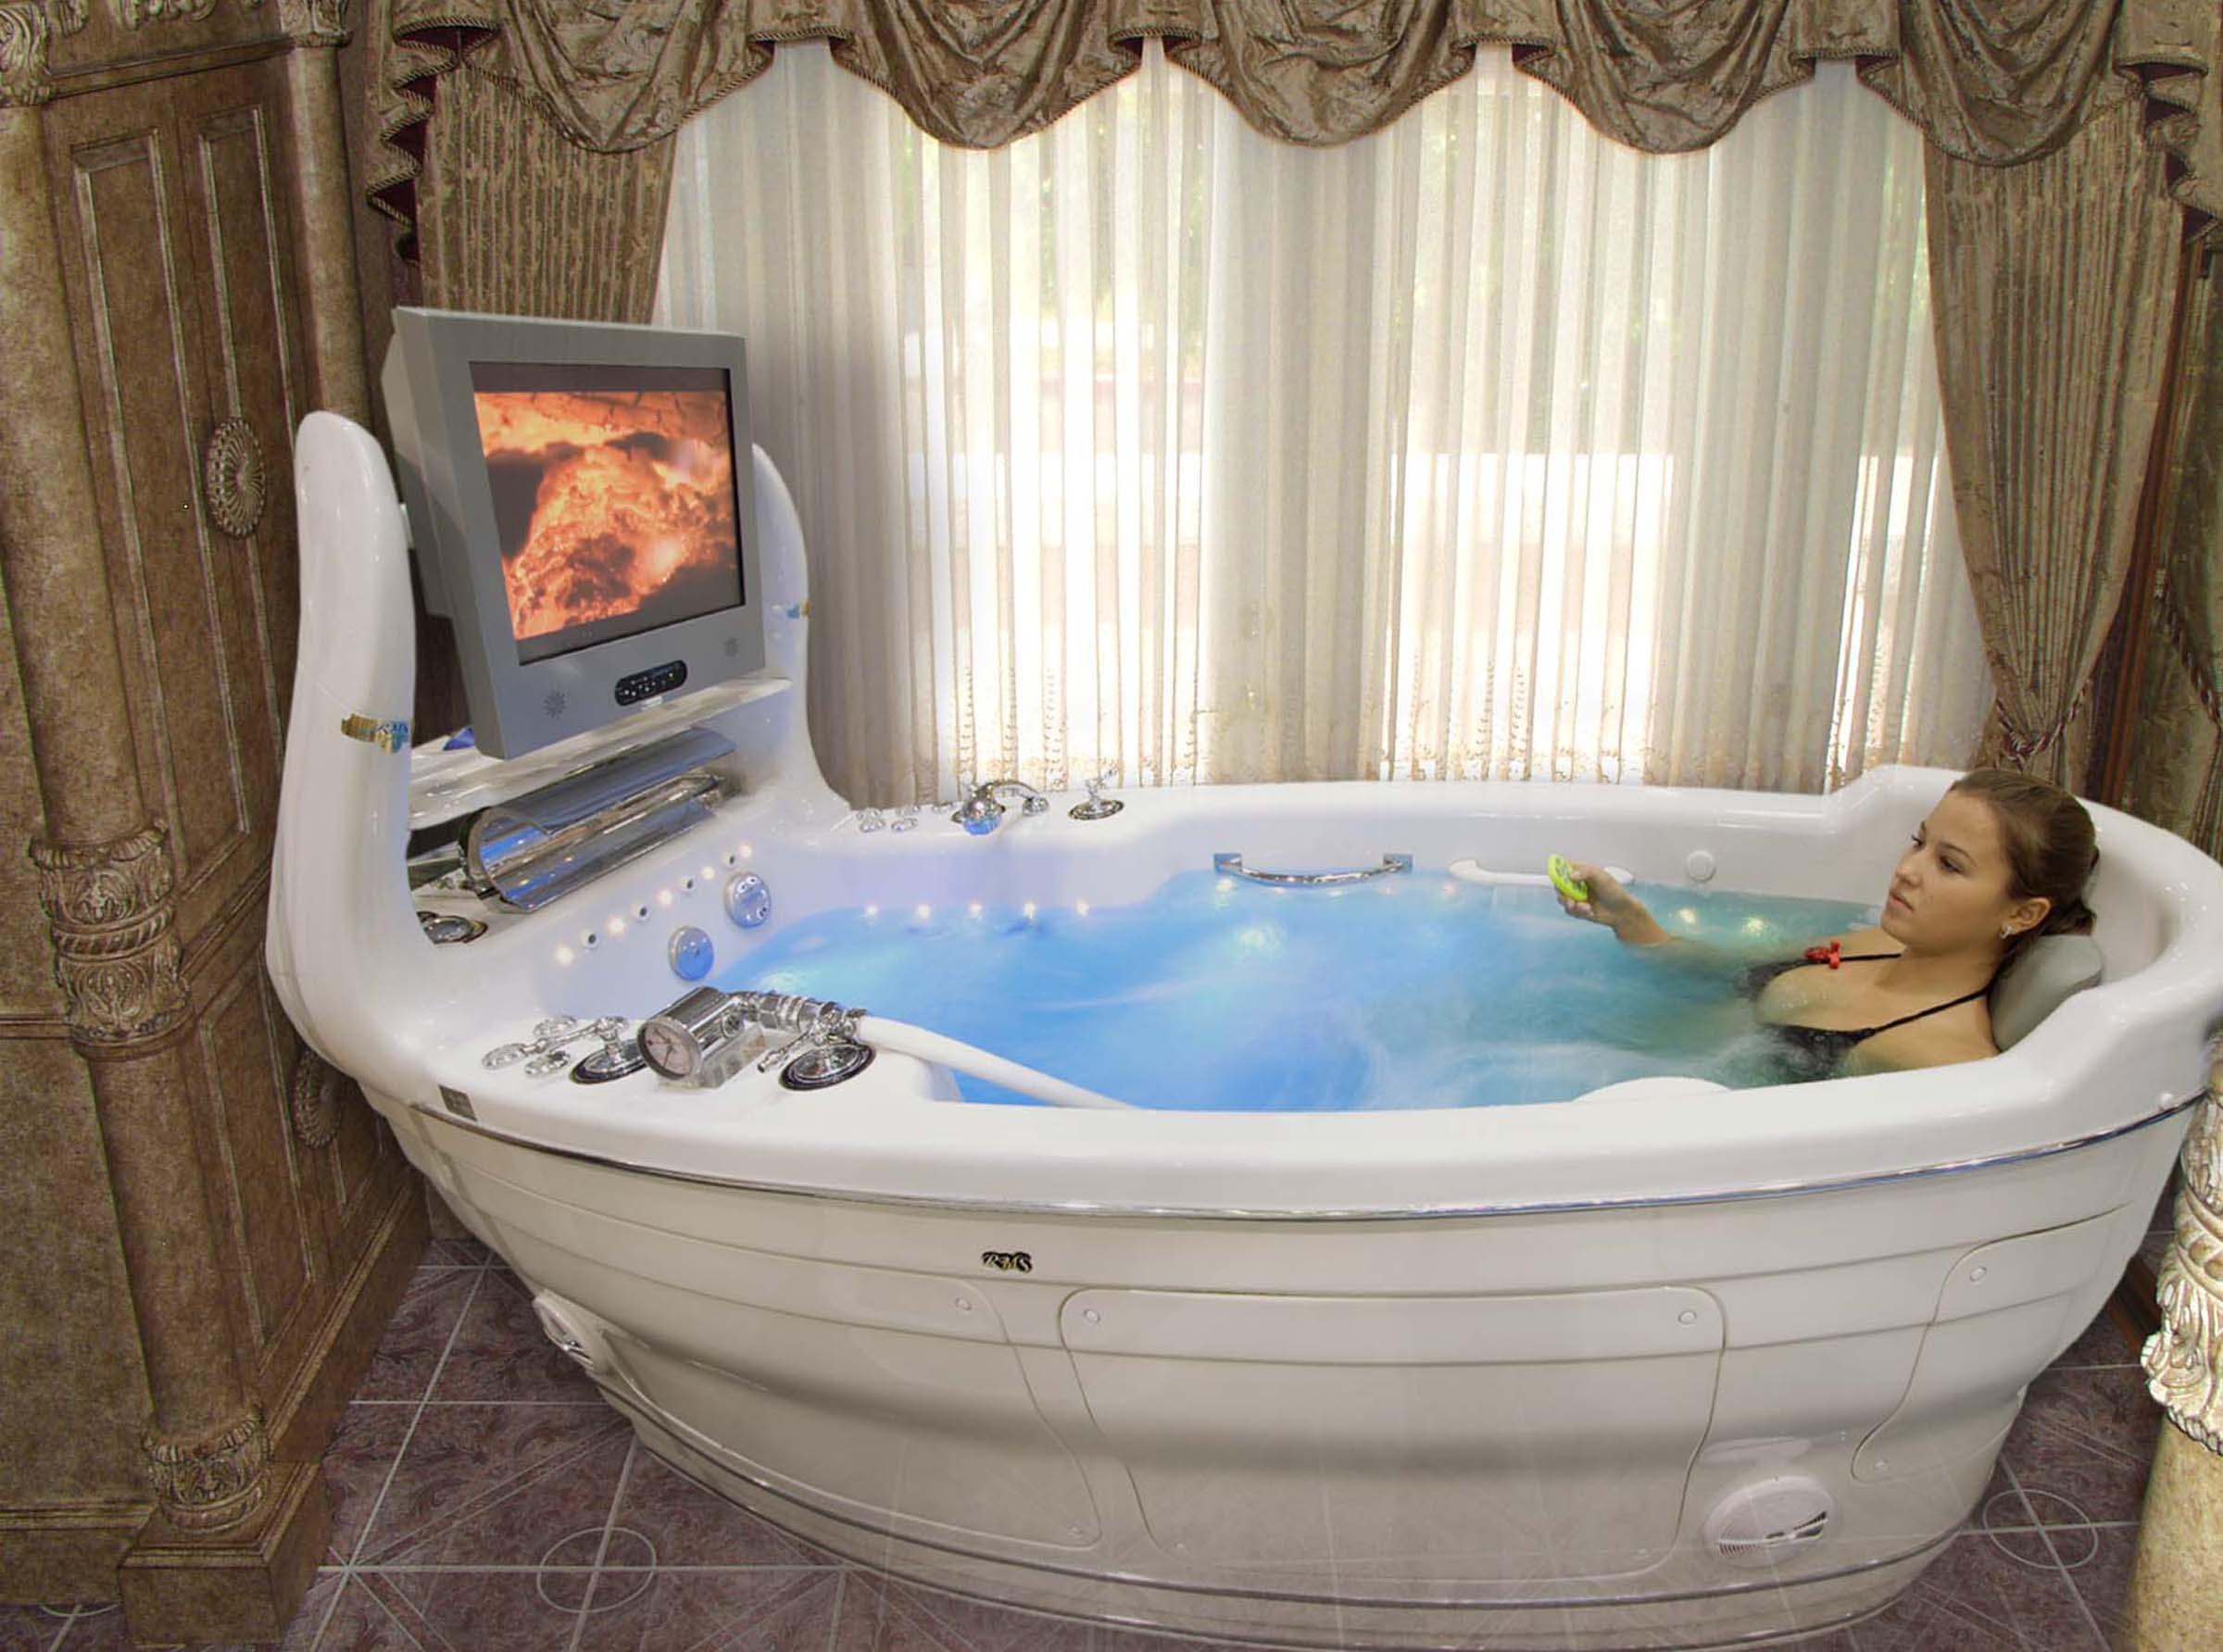 Гидромассажная ванна С-280 T-REM CP- LE Фото, Изображение